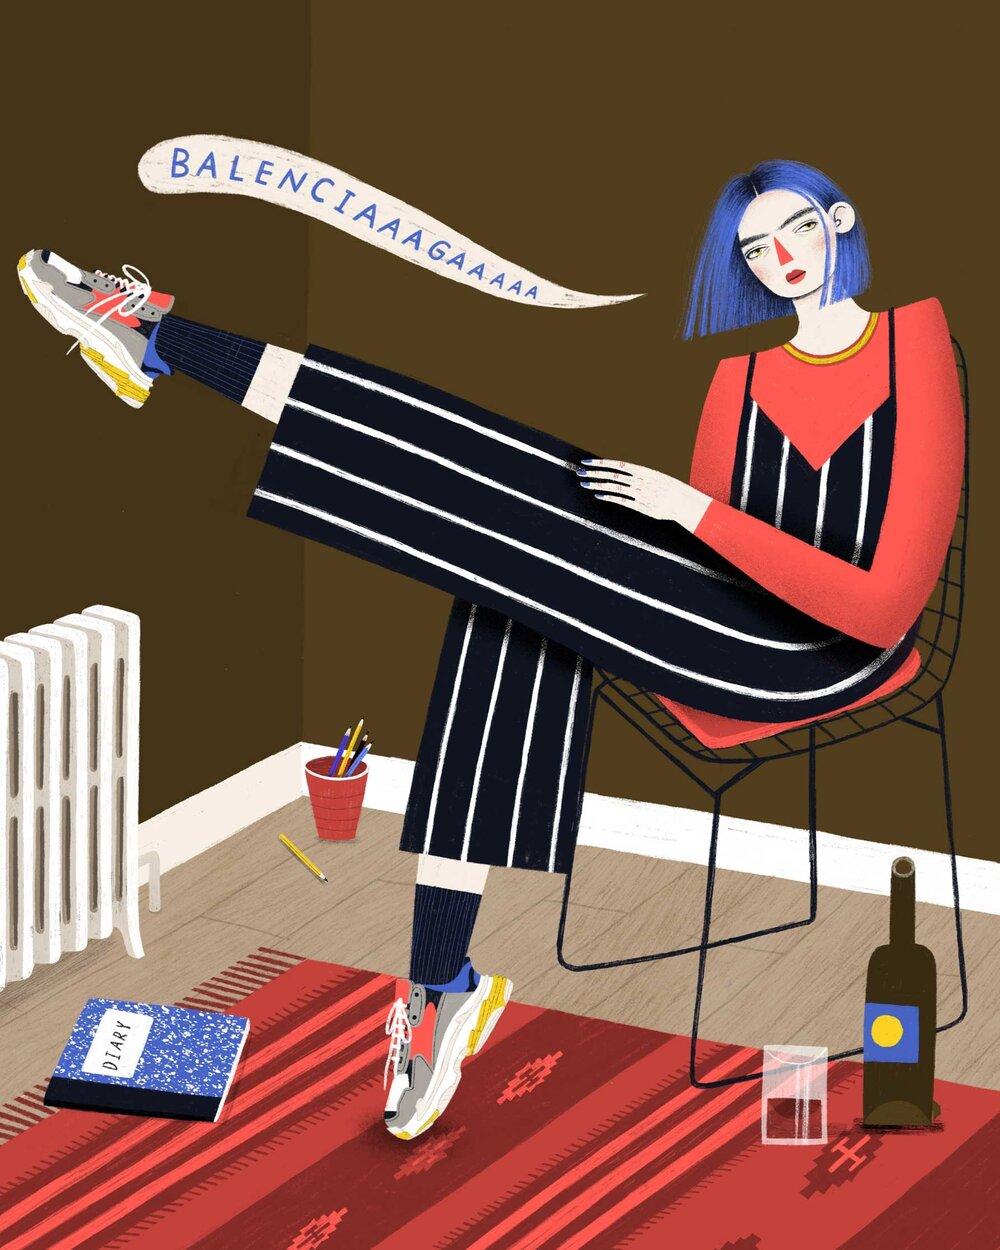 BalenciagaGirl.jpg